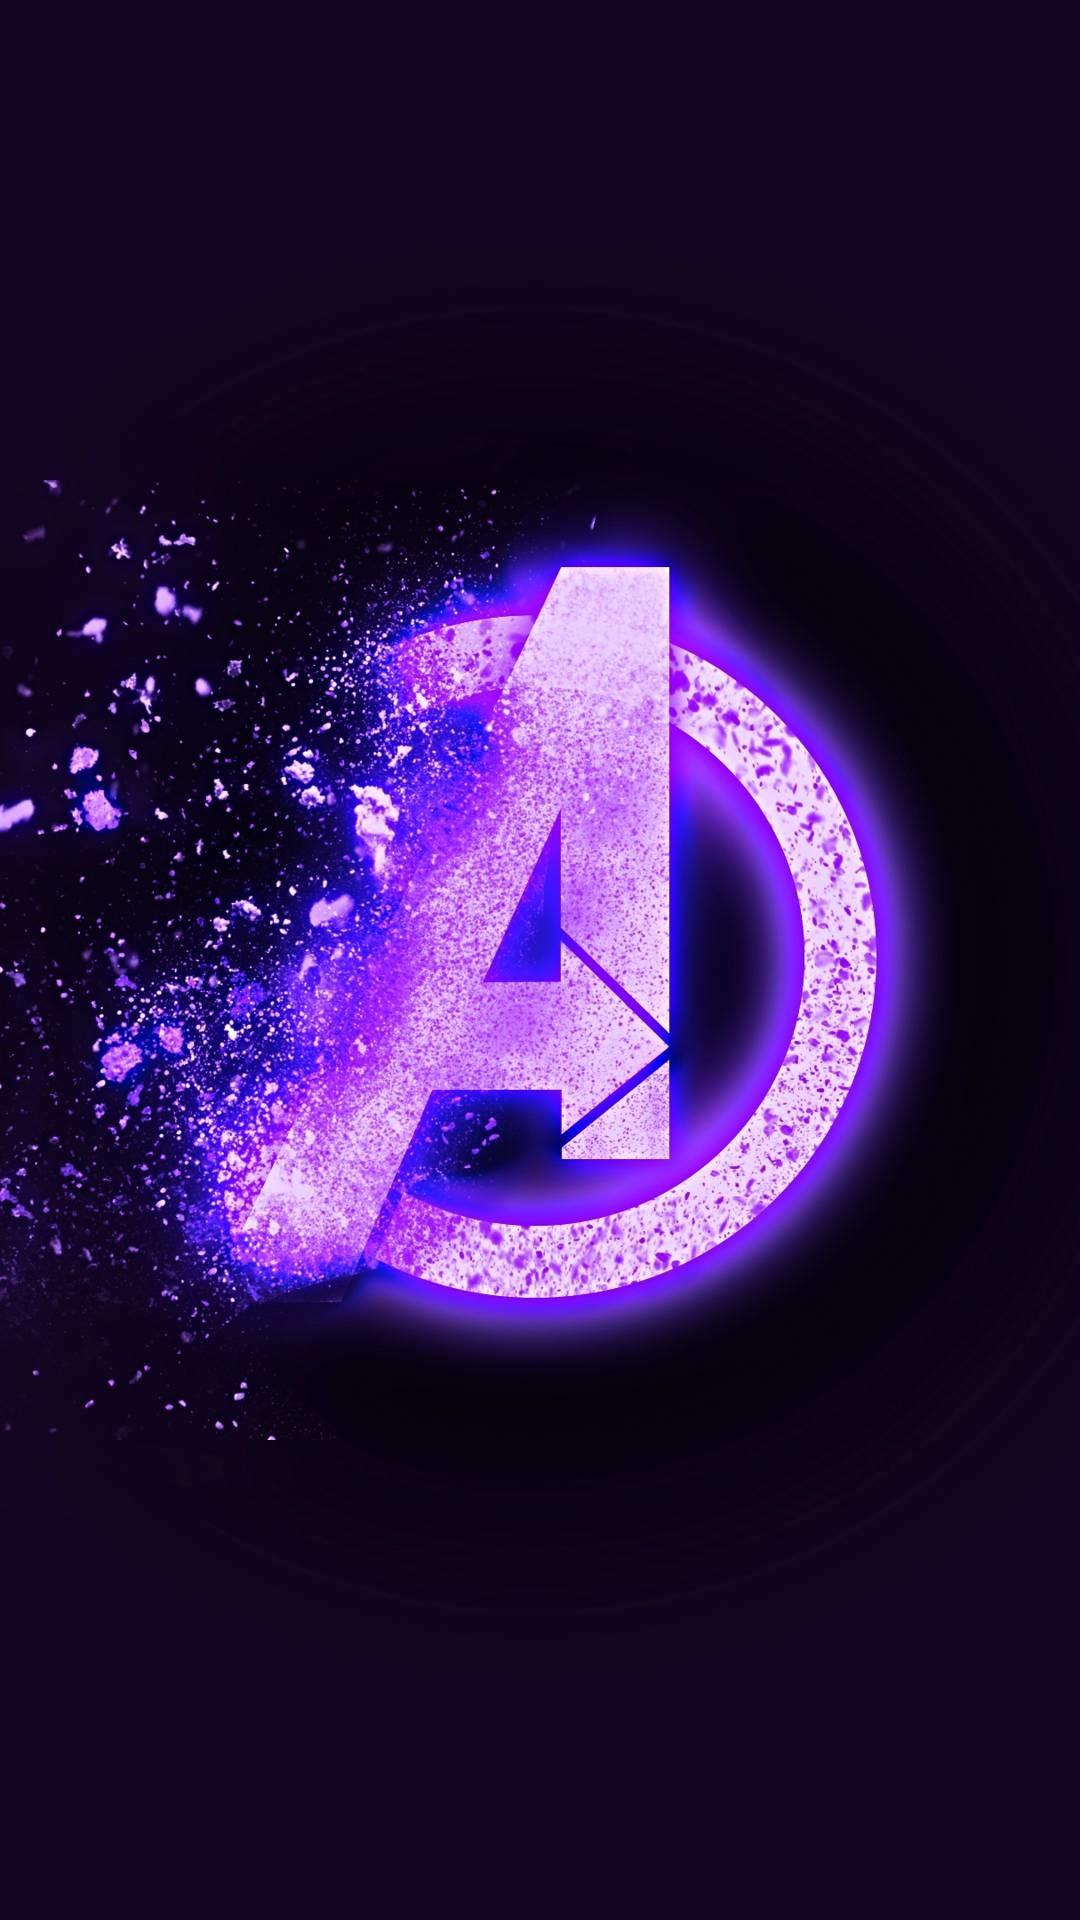 Avengers Logo Wallpapers Hd Wallpaper Collections 4kwallpaper Wiki